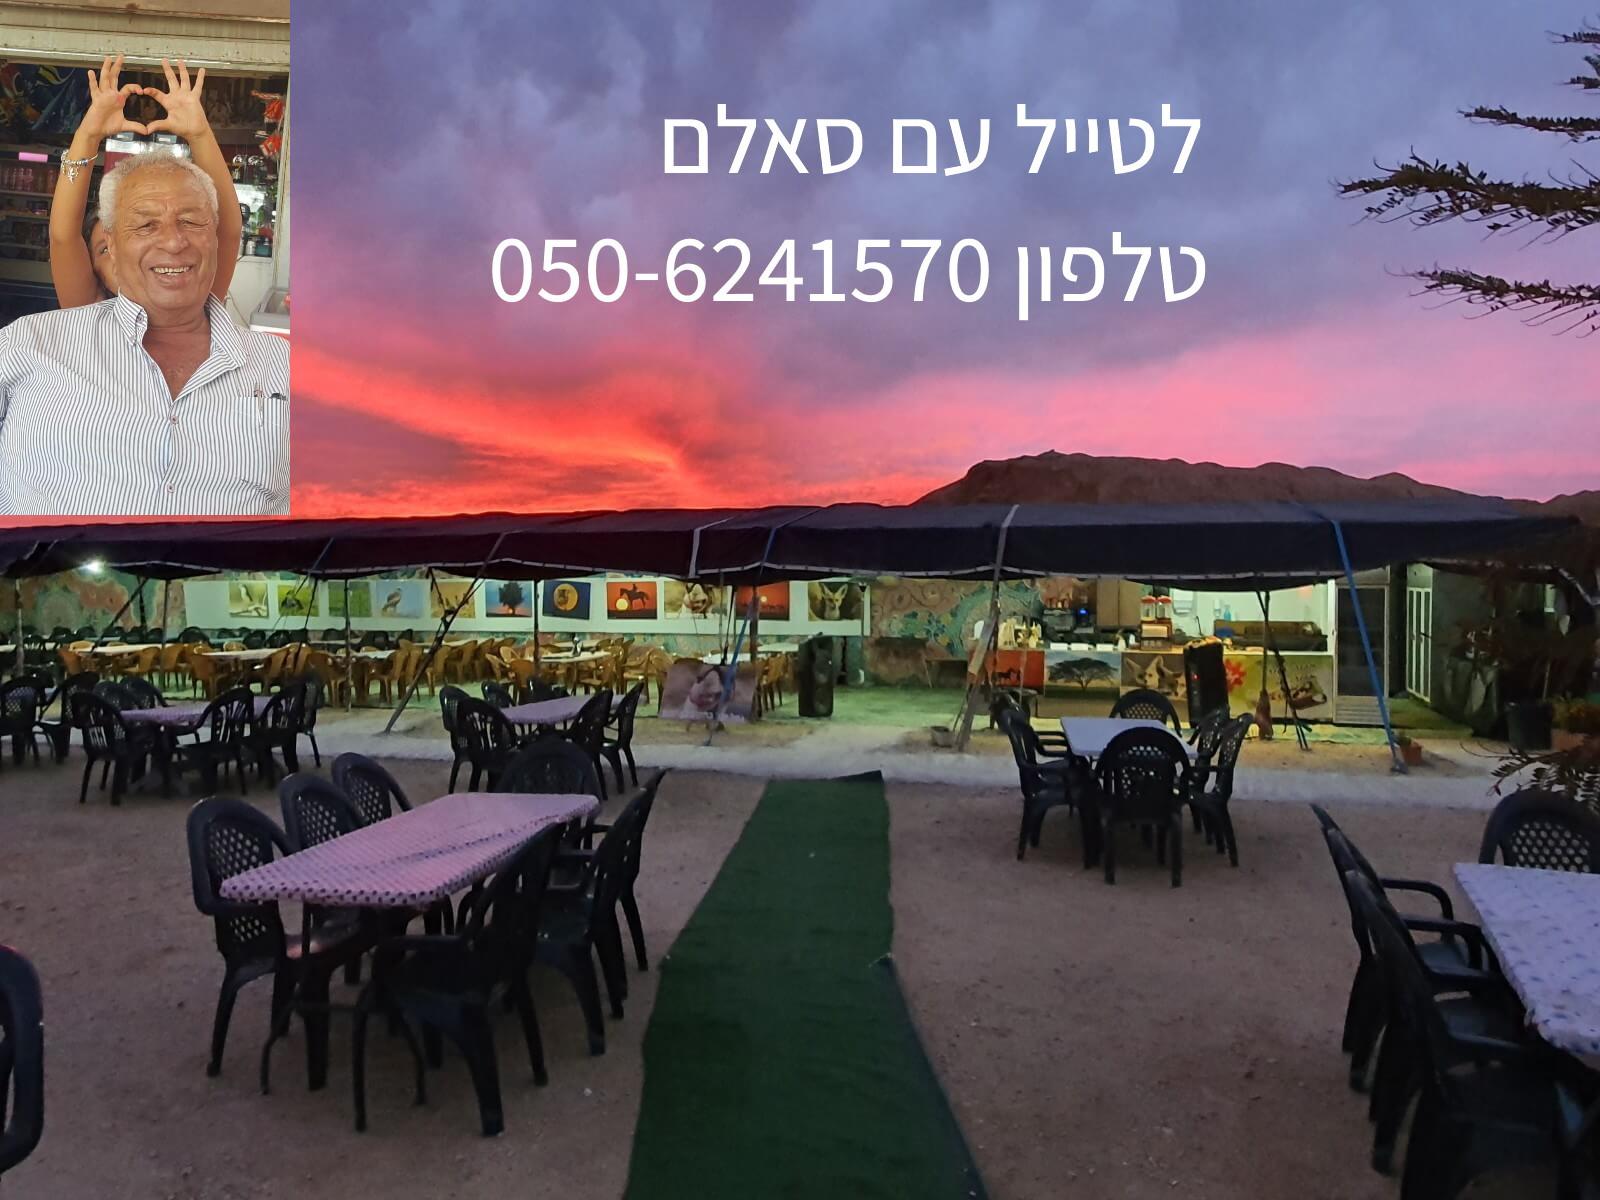 Explore the Negev with Salem abu Siam